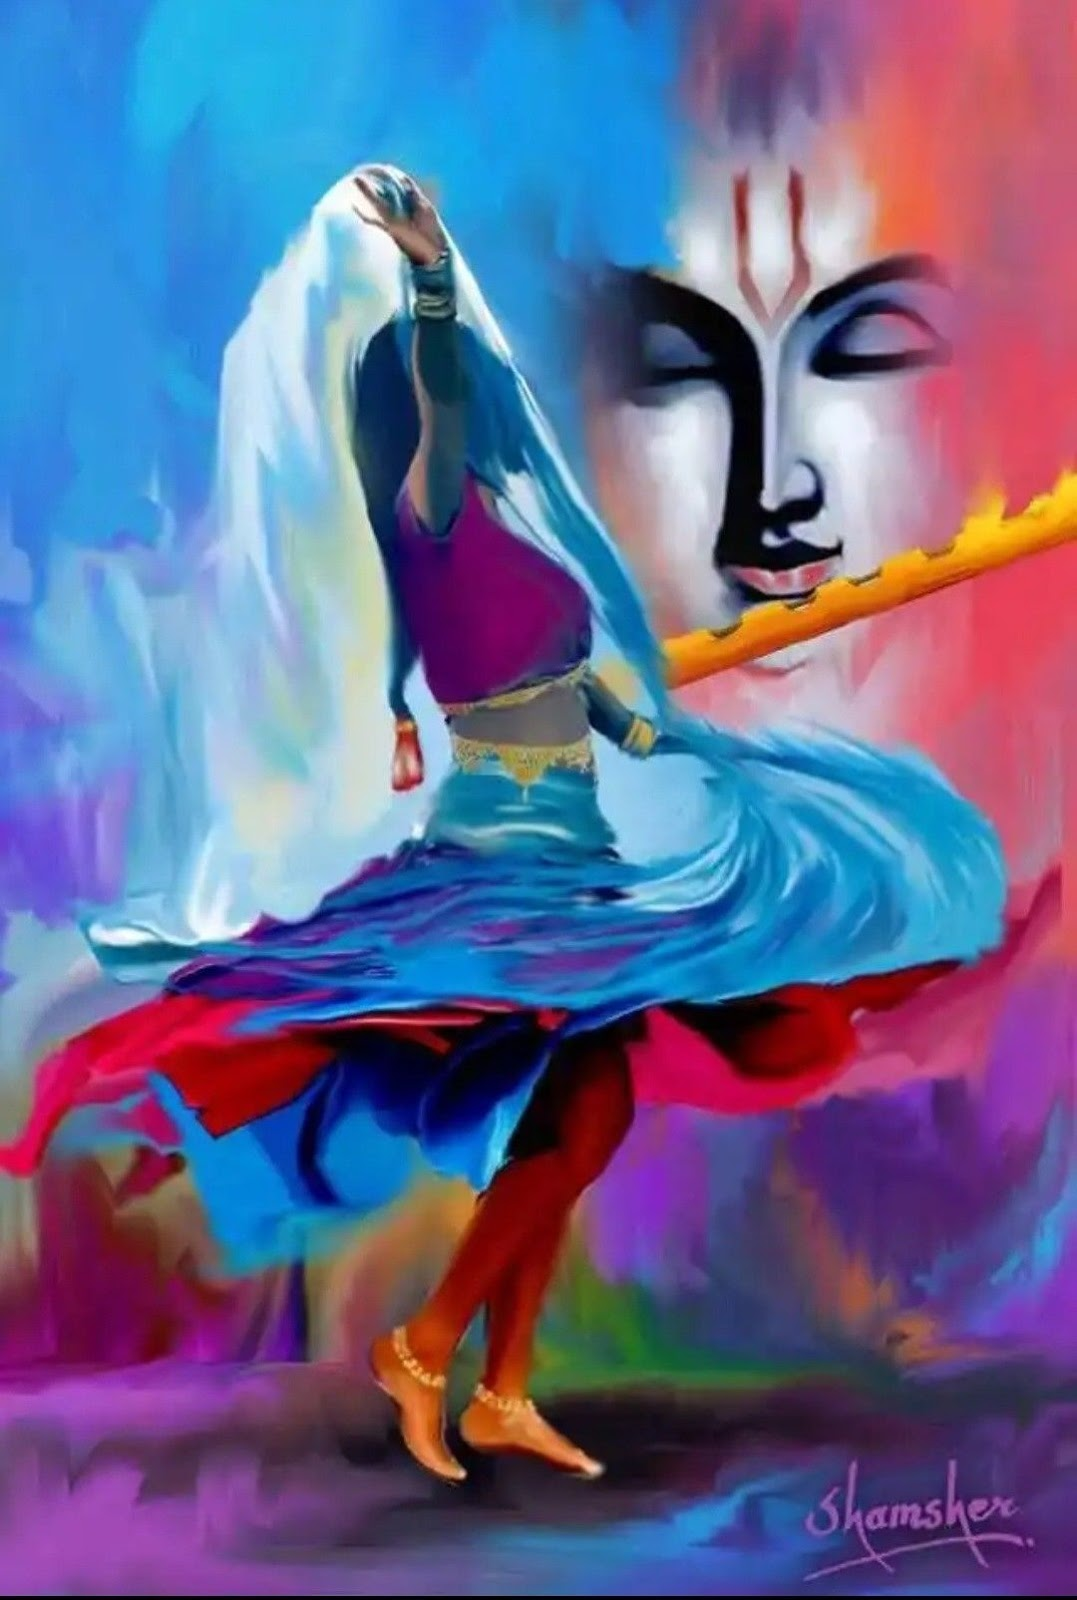 320 Lord Radha Krishna Images Hd Love Photos And 3d Pics 2020 Good Morning Images 2020